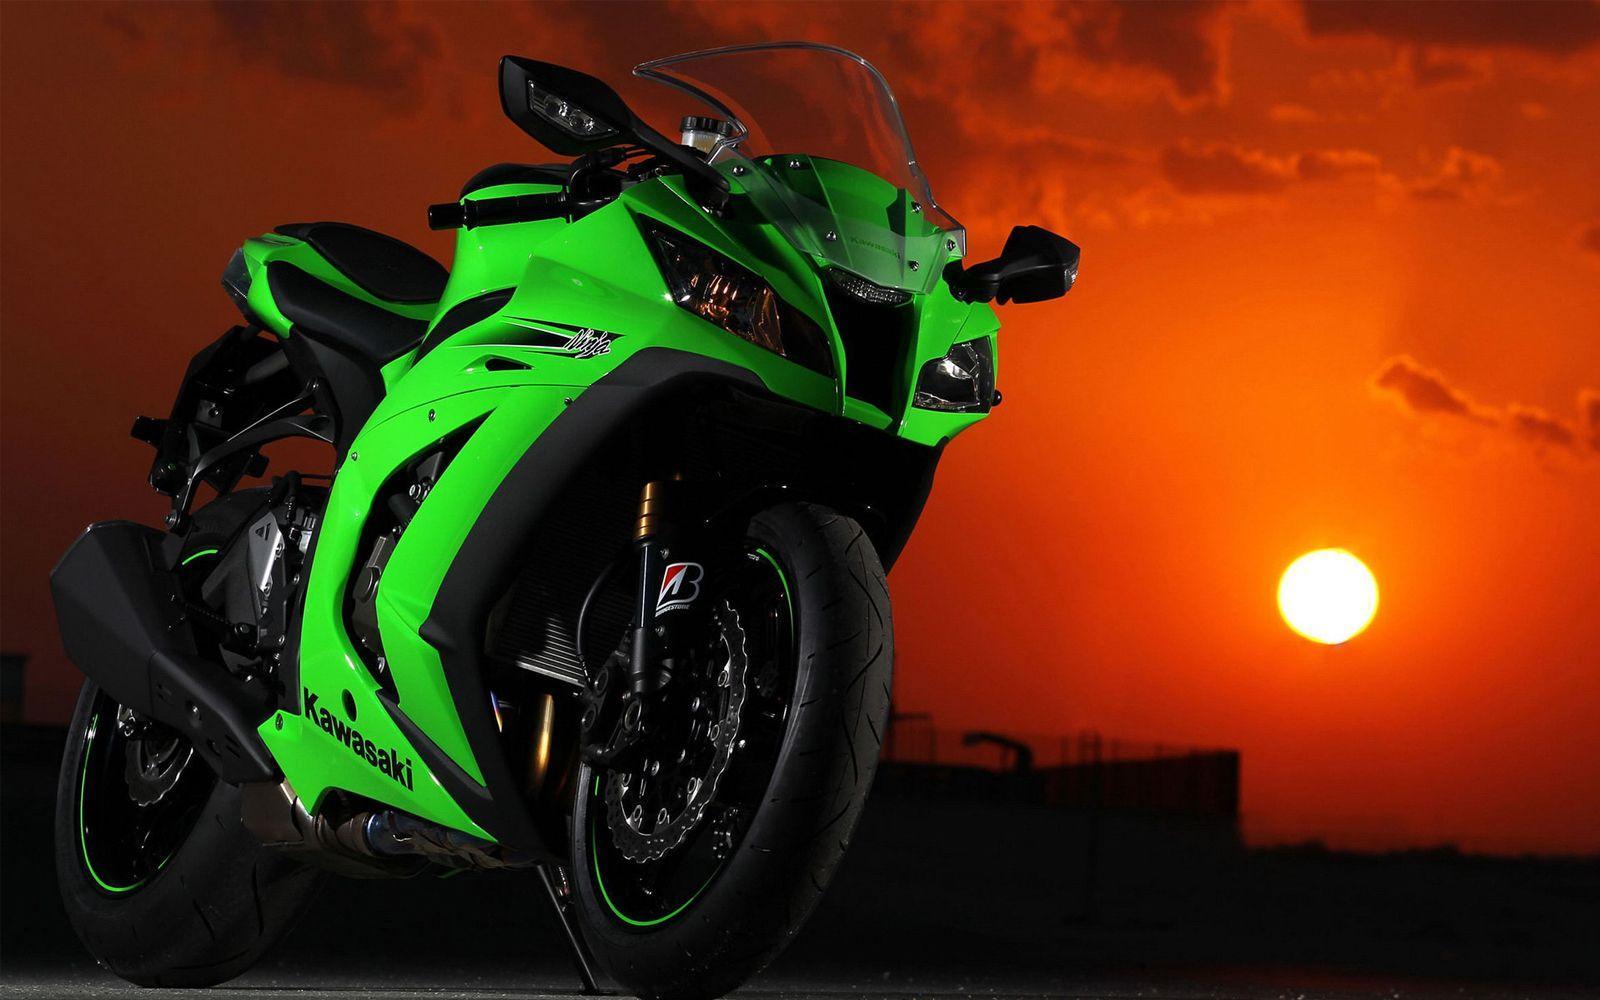 Kawasaki Ninja ZX-10R | HD Wallpapers (High Definition) | Free ...